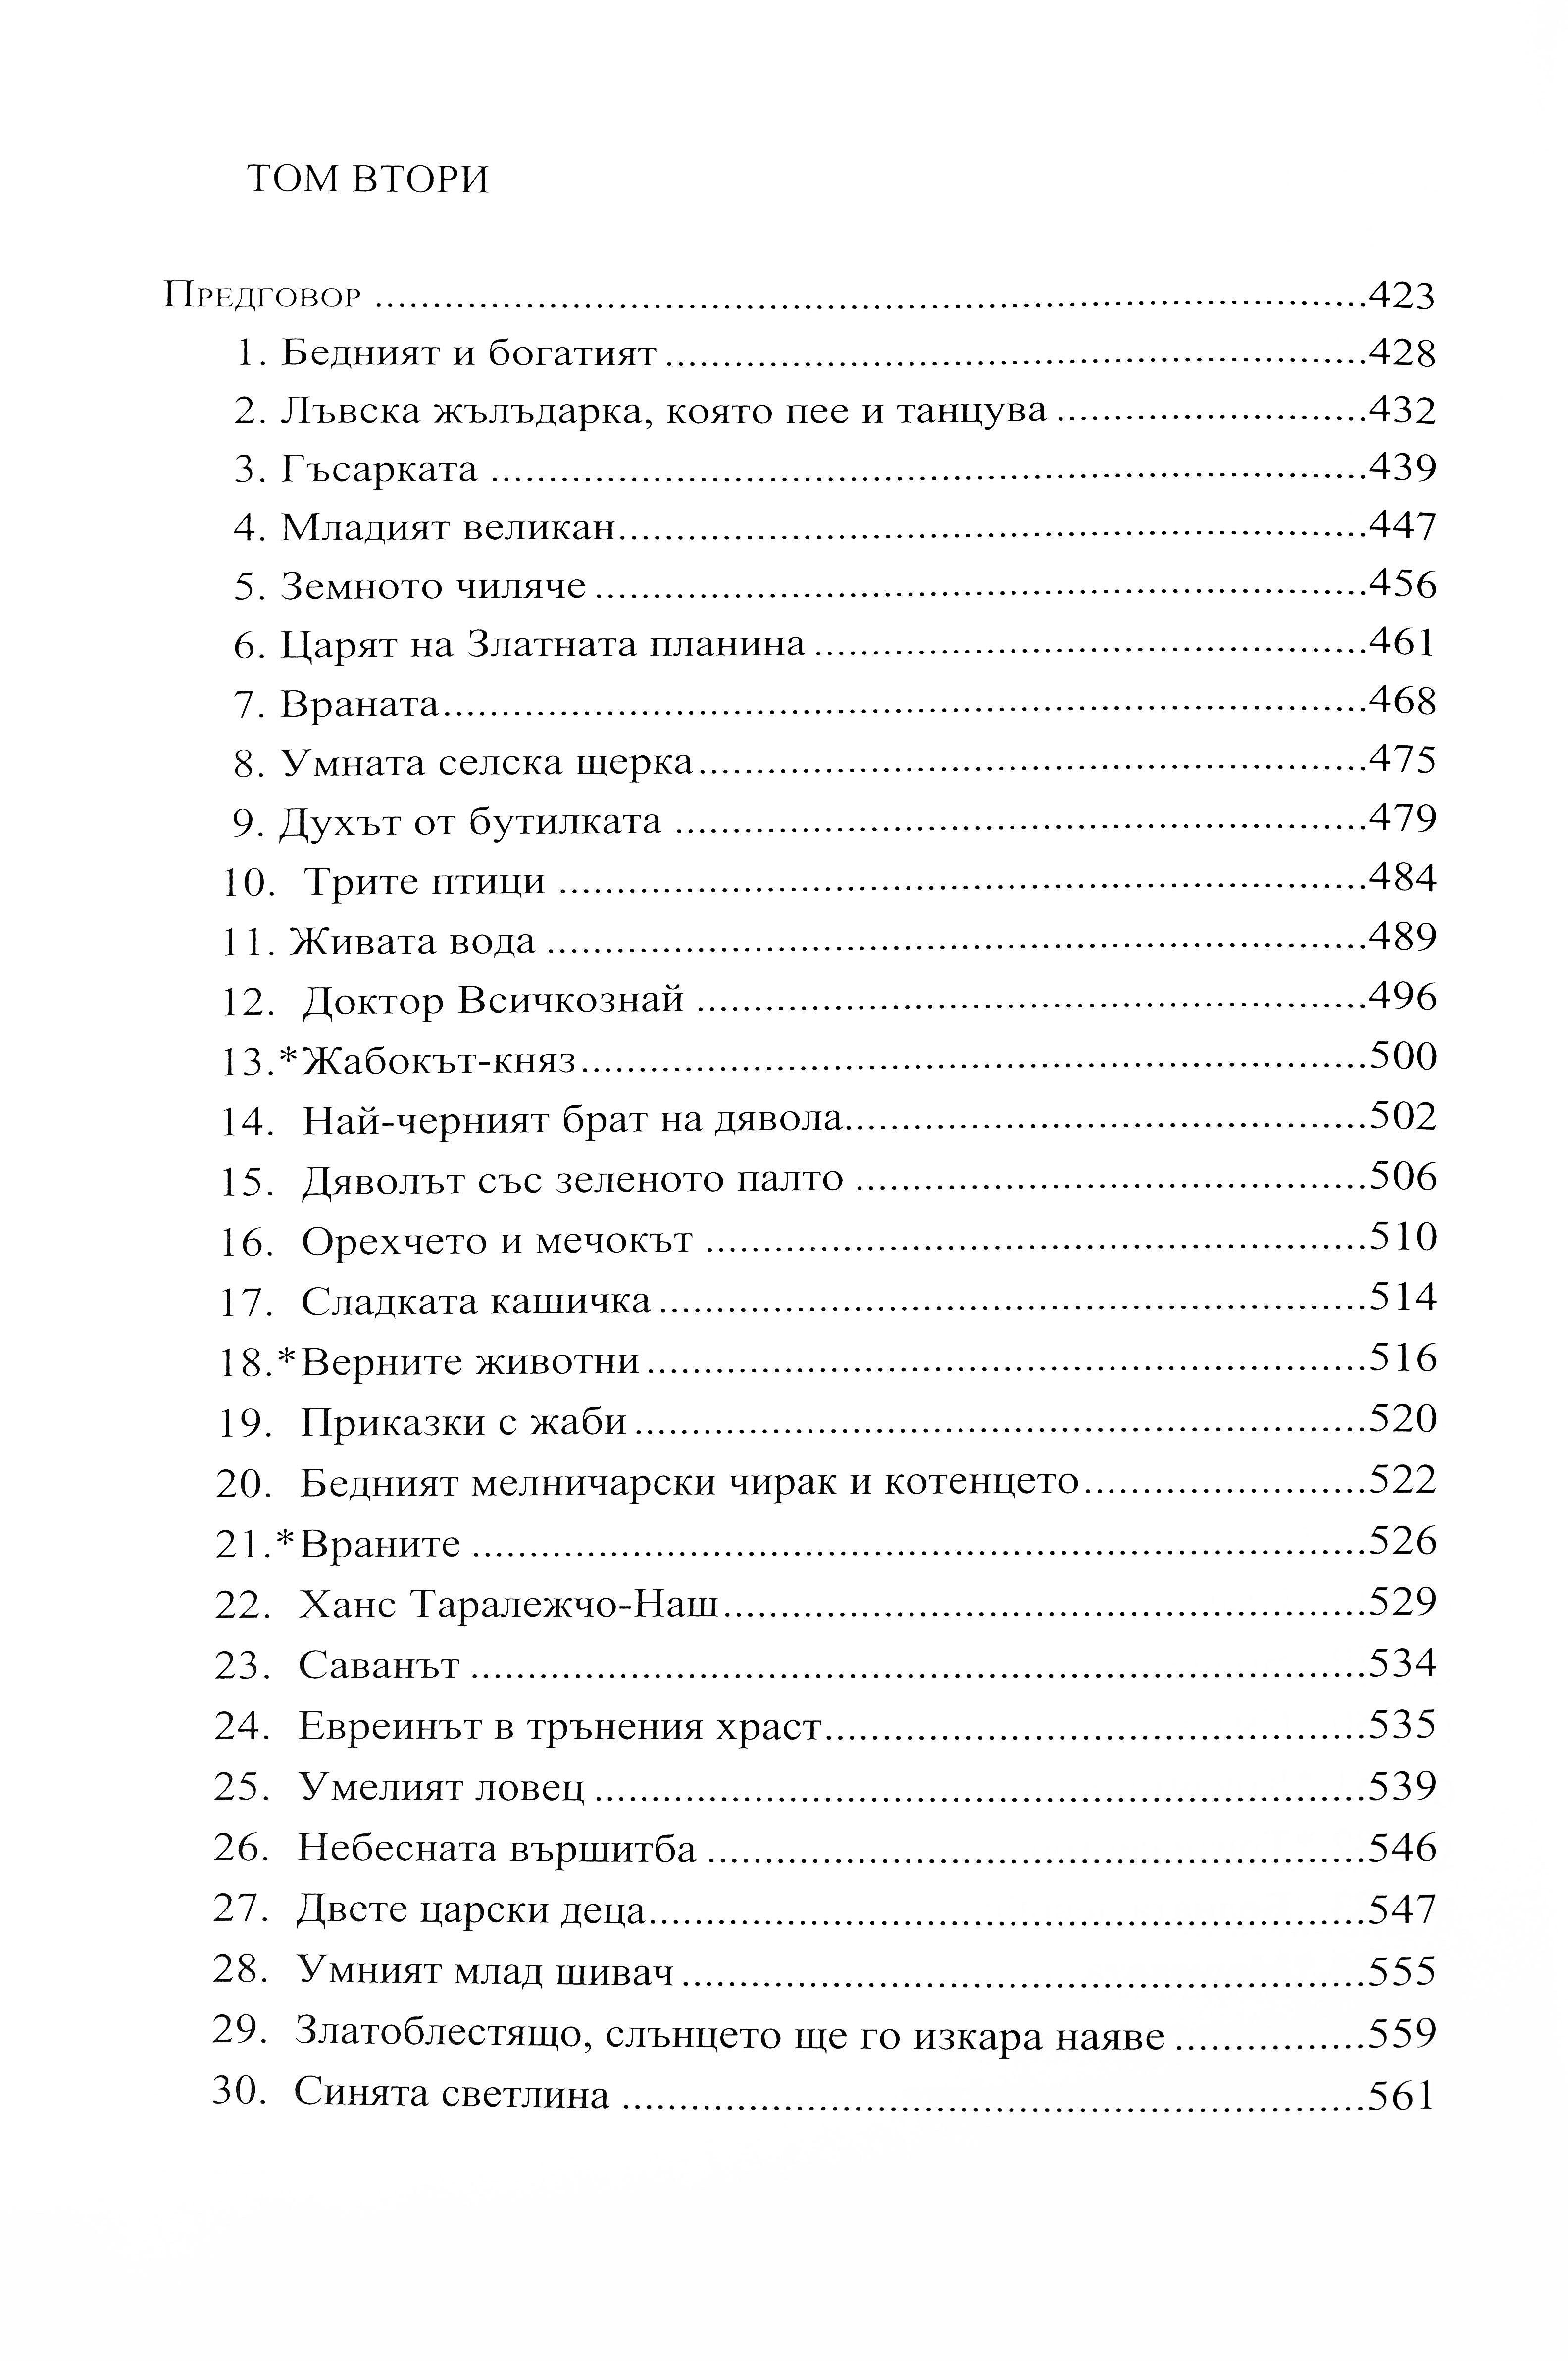 detski-i-domashni-prikazki-tvardi-koritsi-9 - 10